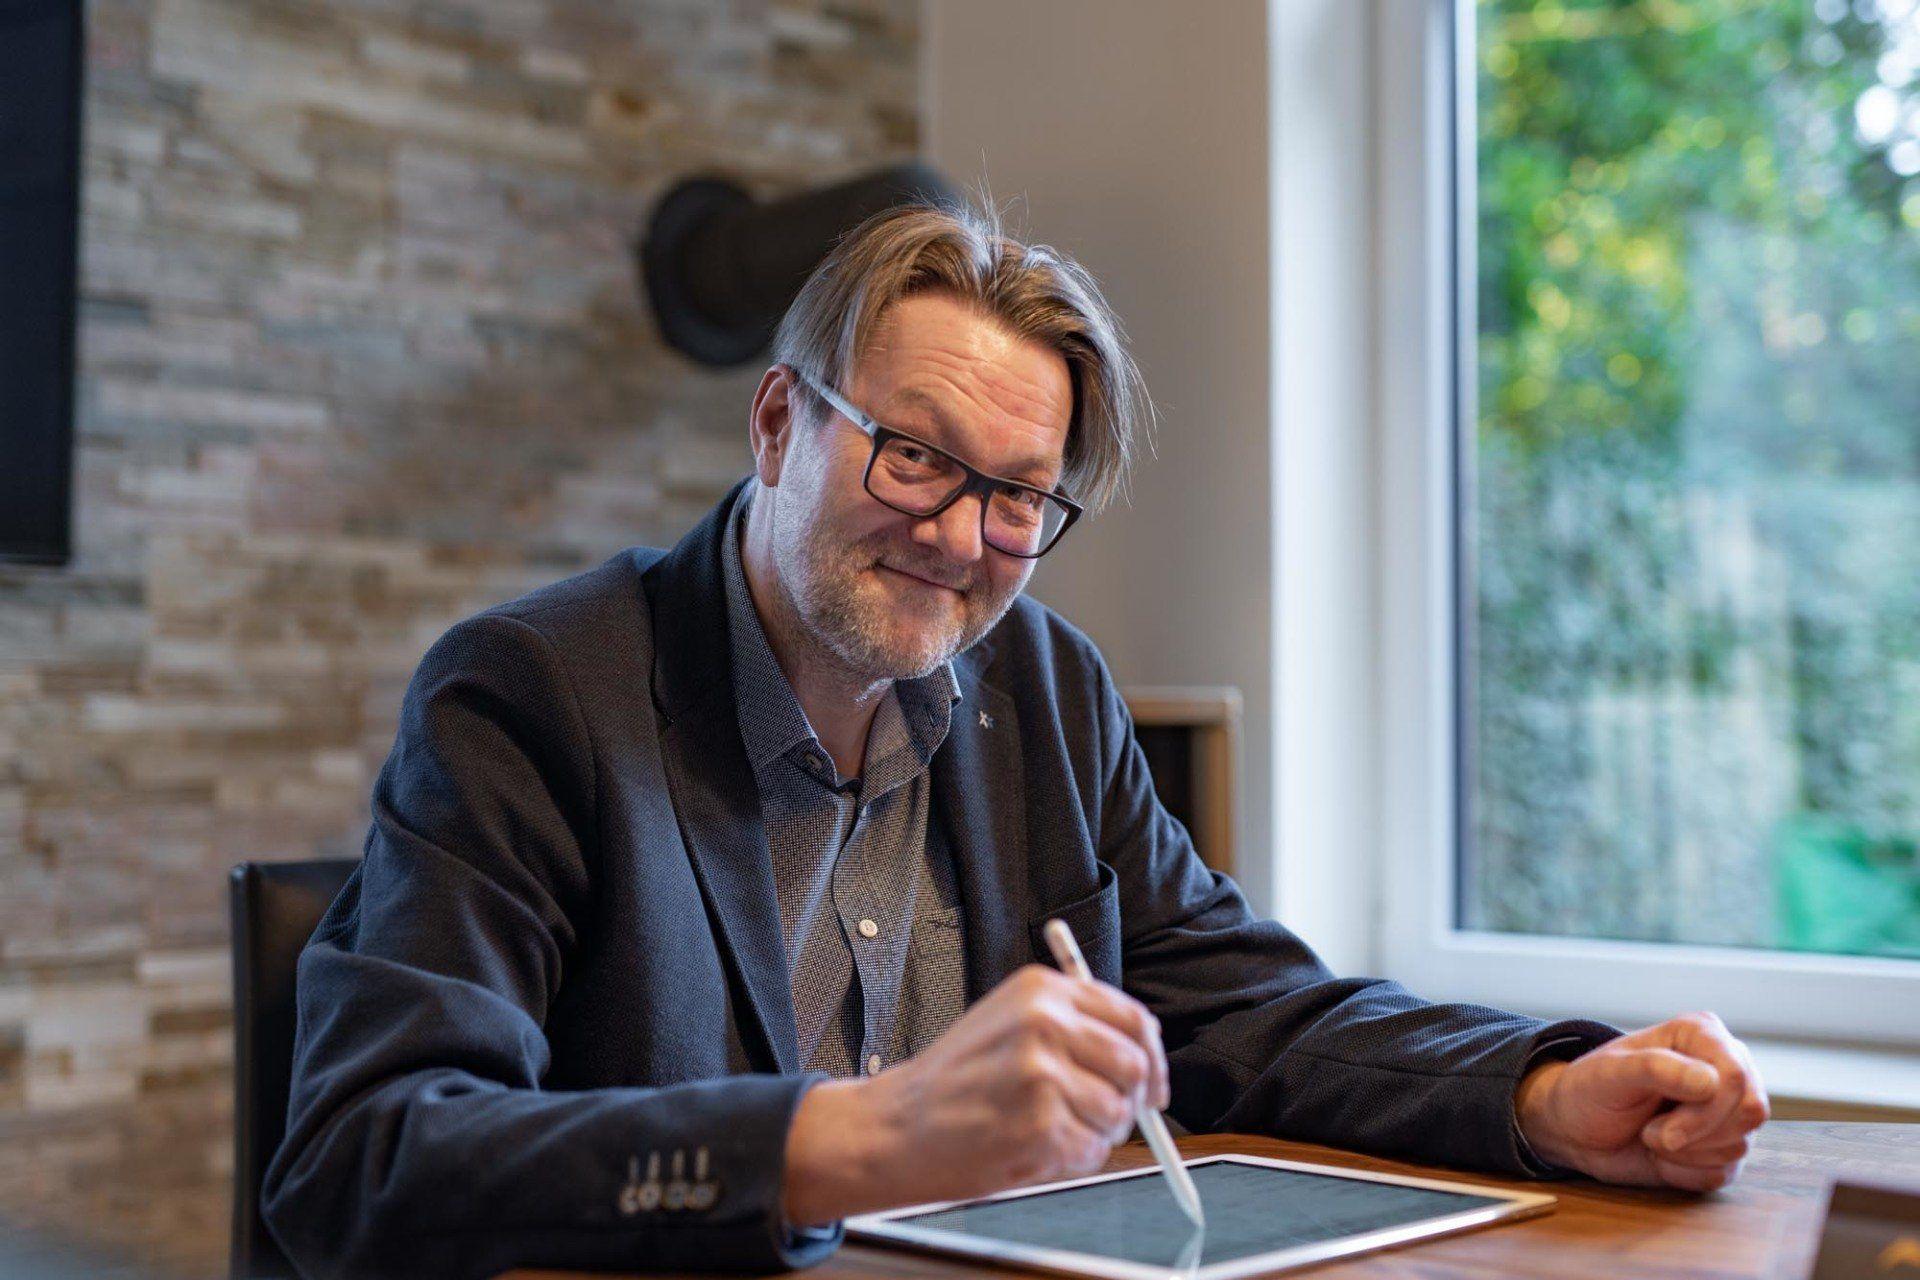 Andreas Schmitz Papenburg